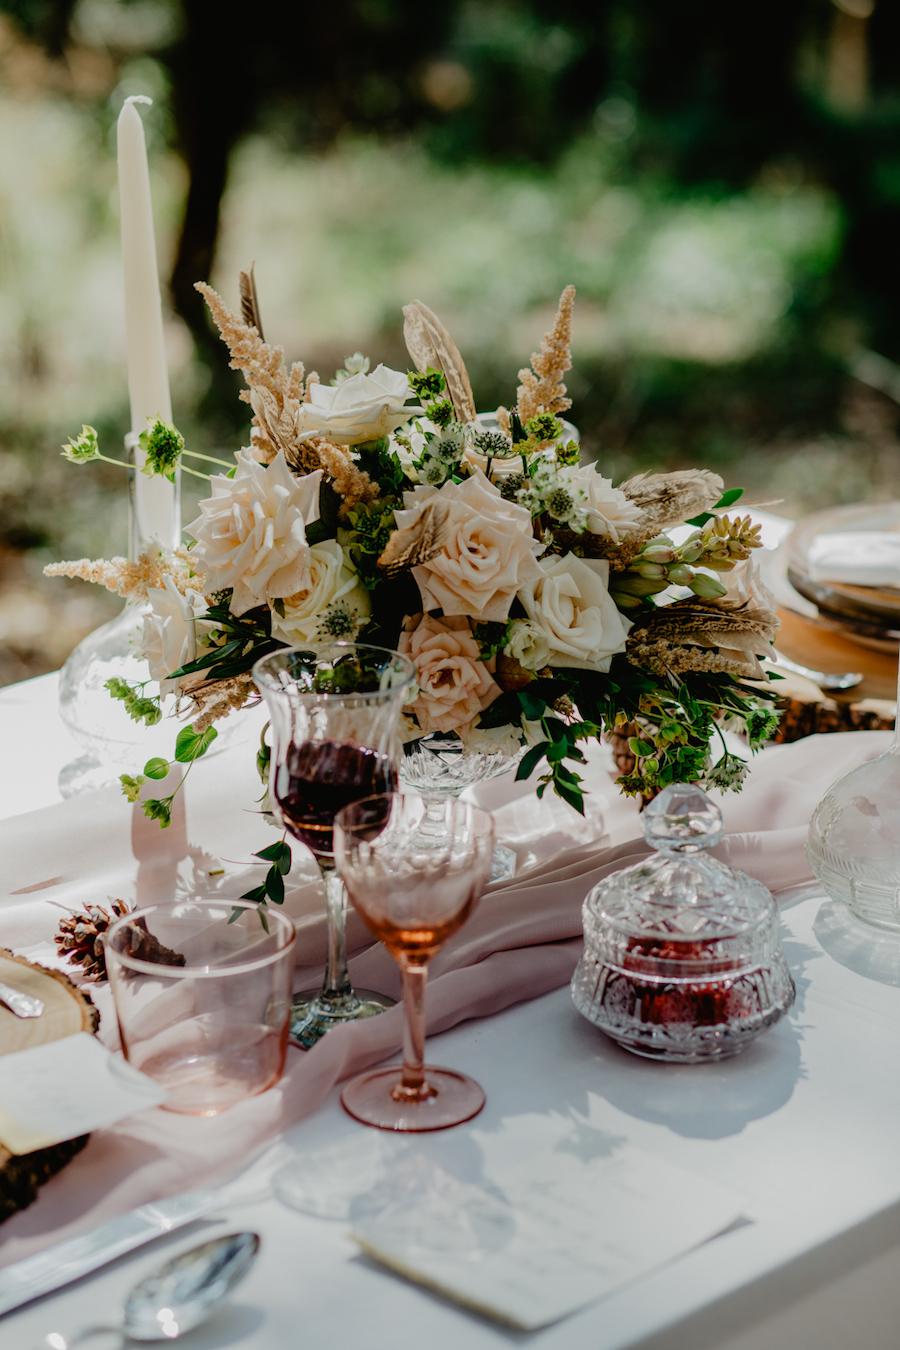 matrimonio-a-tema-stelle-in-pineta-federica-cosentino-22.jpg